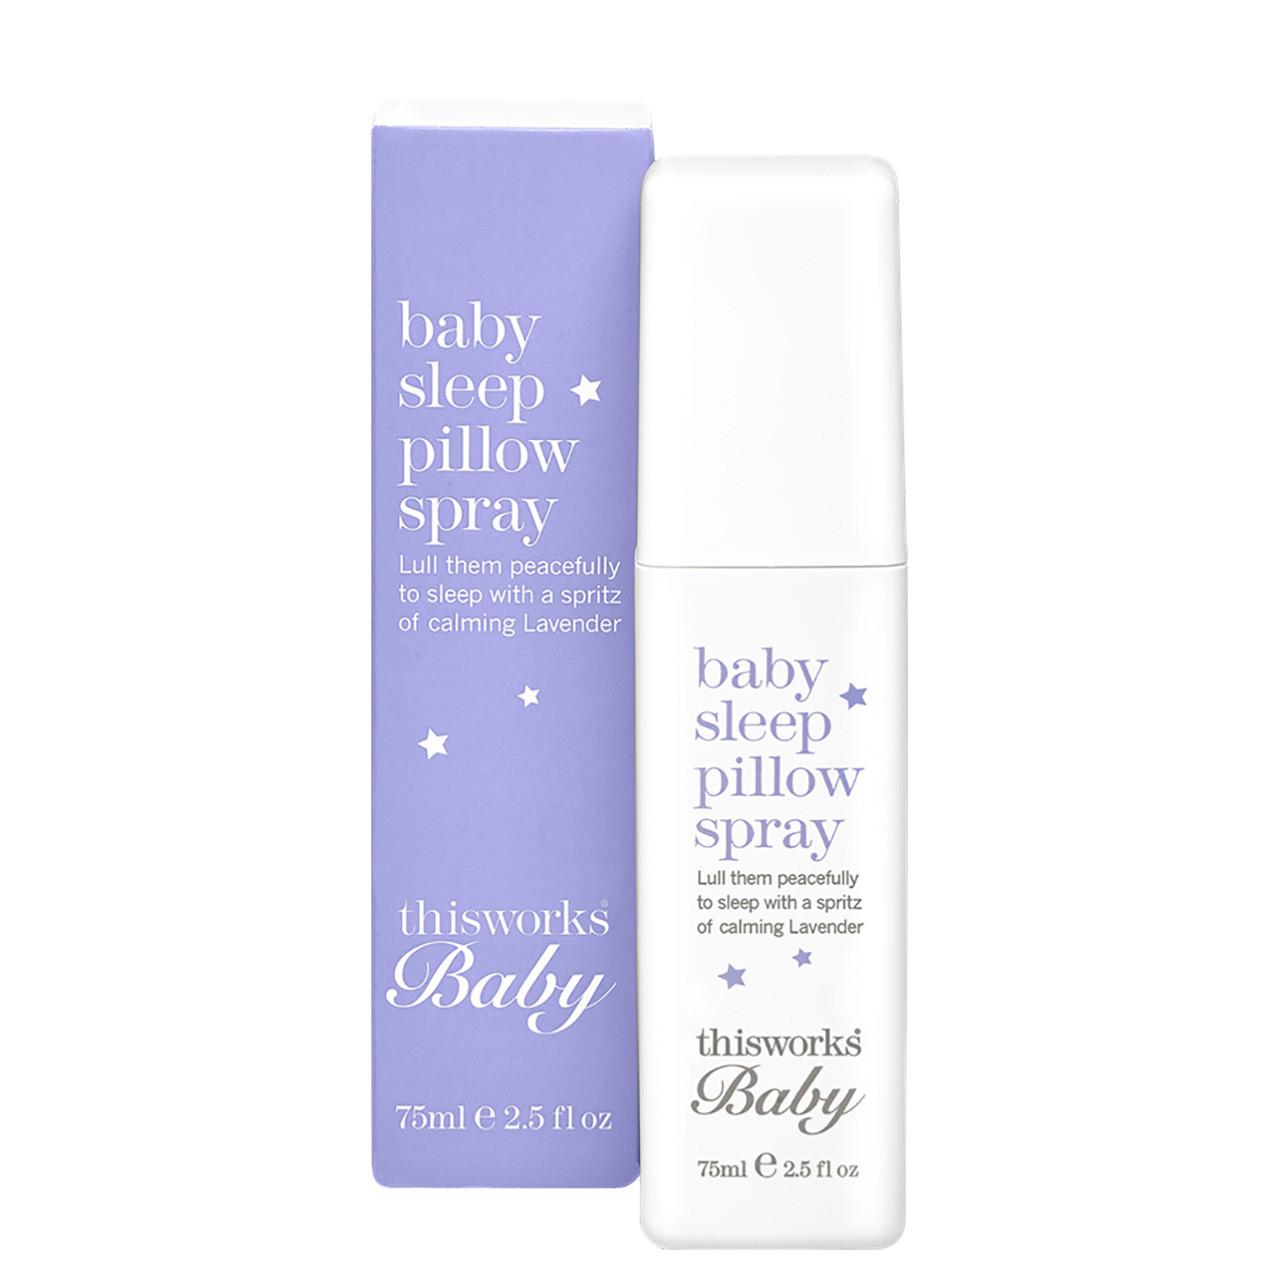 this works Baby Sleep Pillow Spray